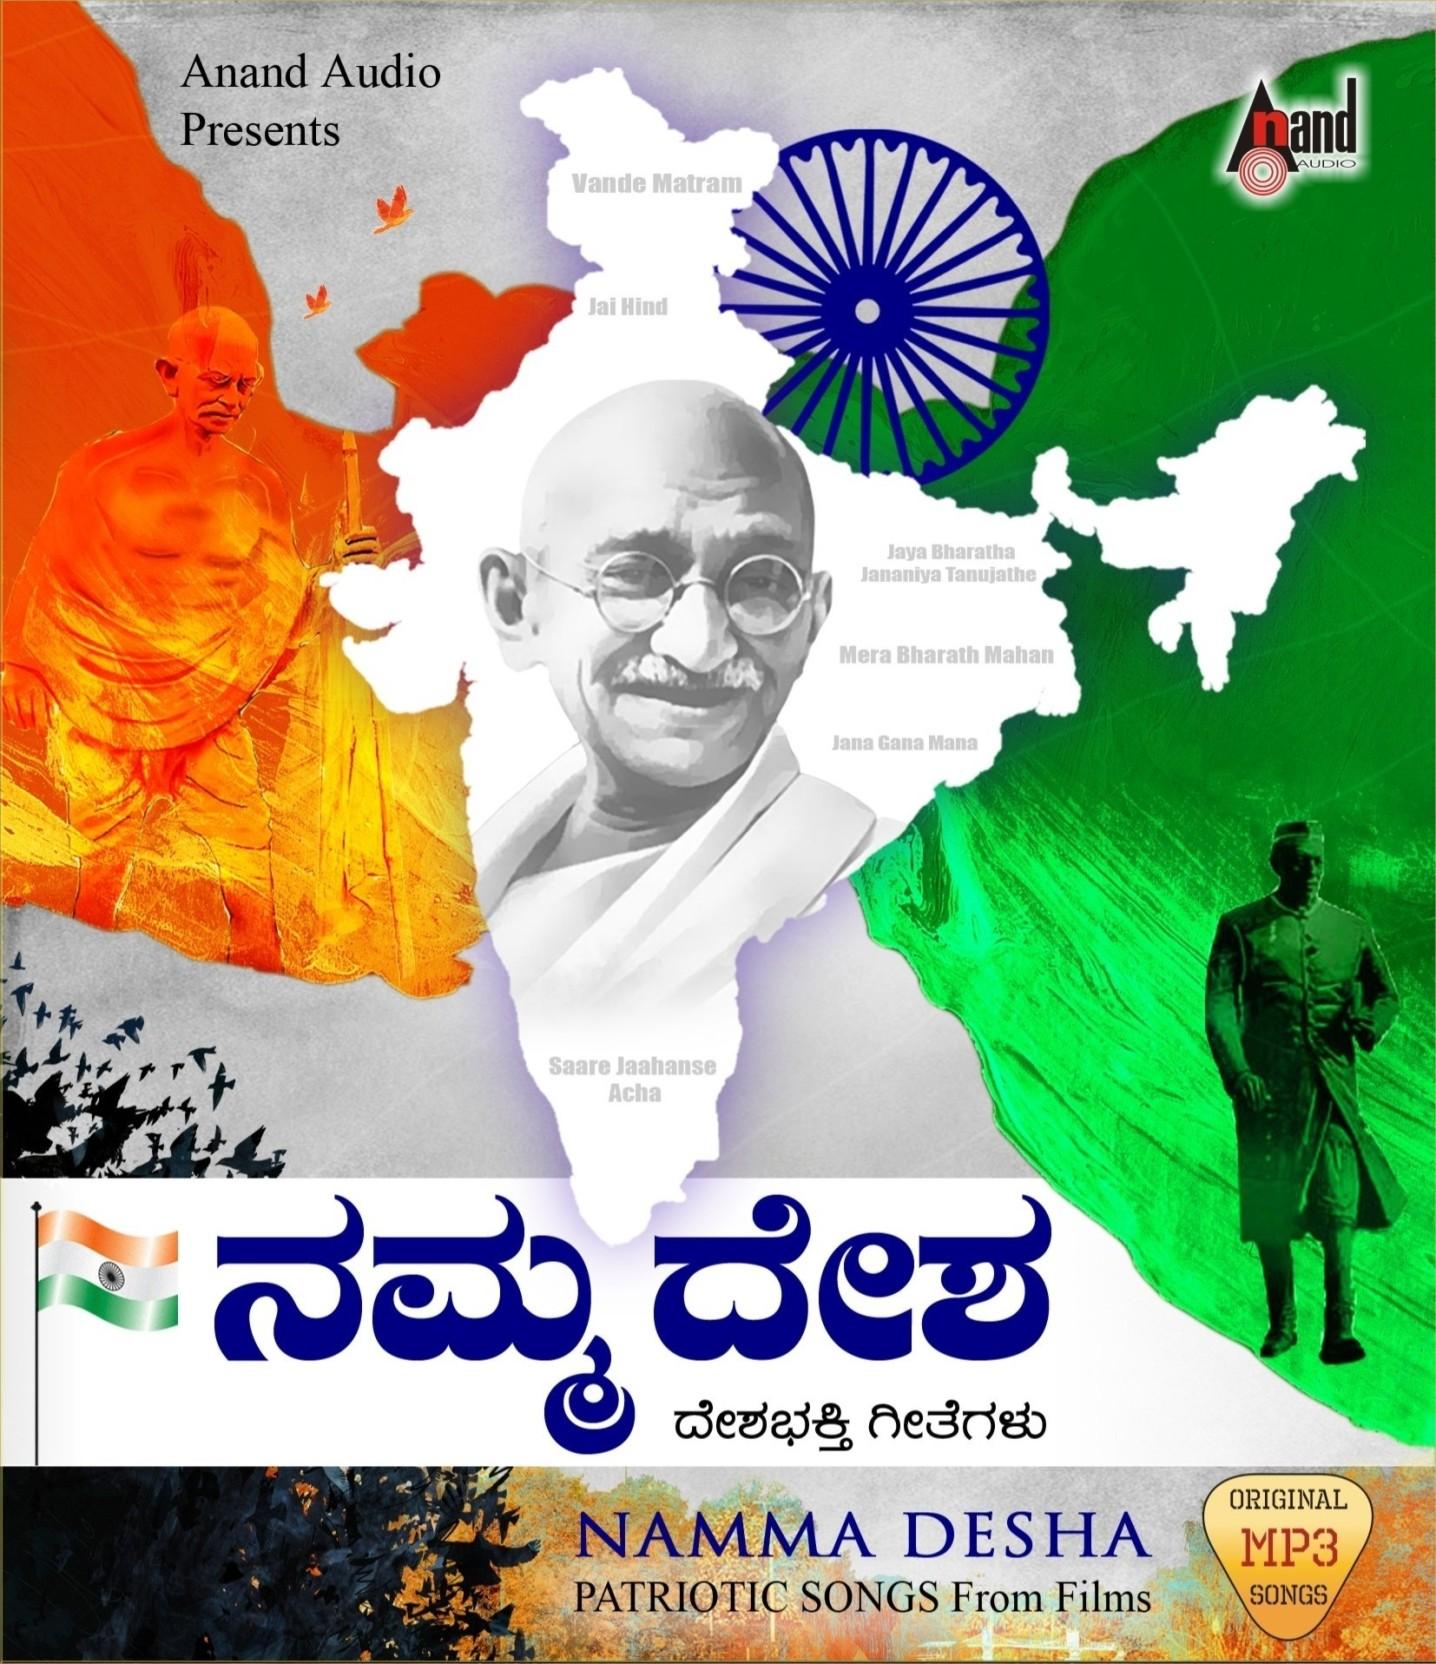 Namma Desha Music MP3 - Price In India  Buy Namma Desha